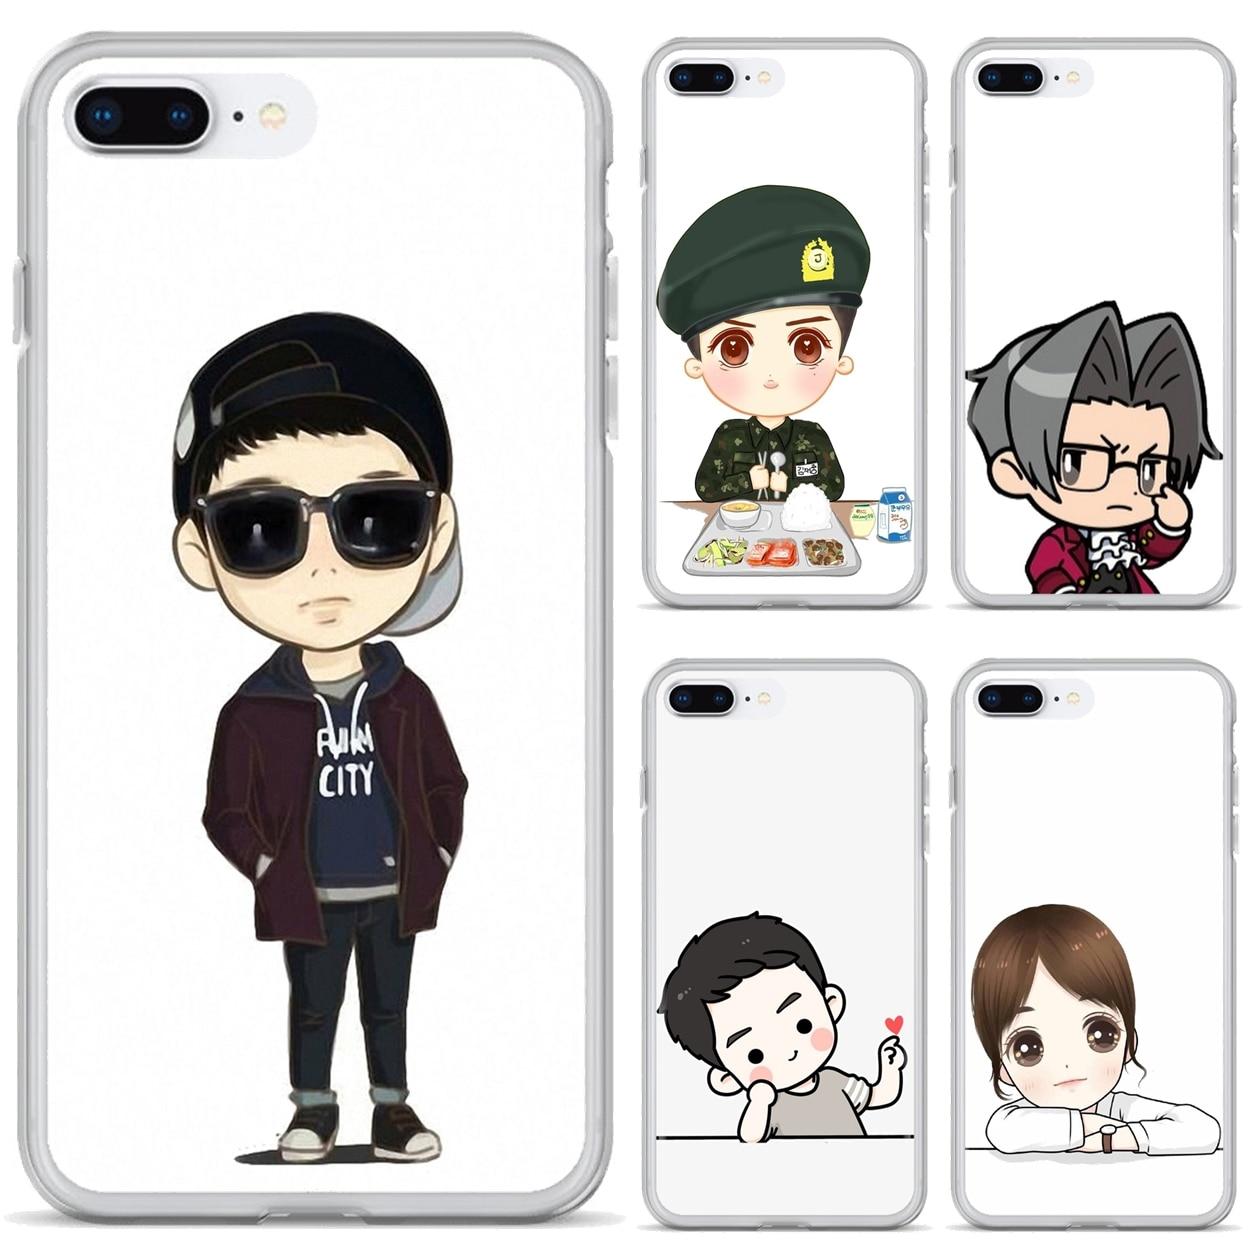 Descendants of the sun Cartoon For Xiaomi Redmi 4A 7A S2 Note 8 3 3S 4 4X 5 Plus 6 7 6A Pro Pocophone F1 Silicone Housing